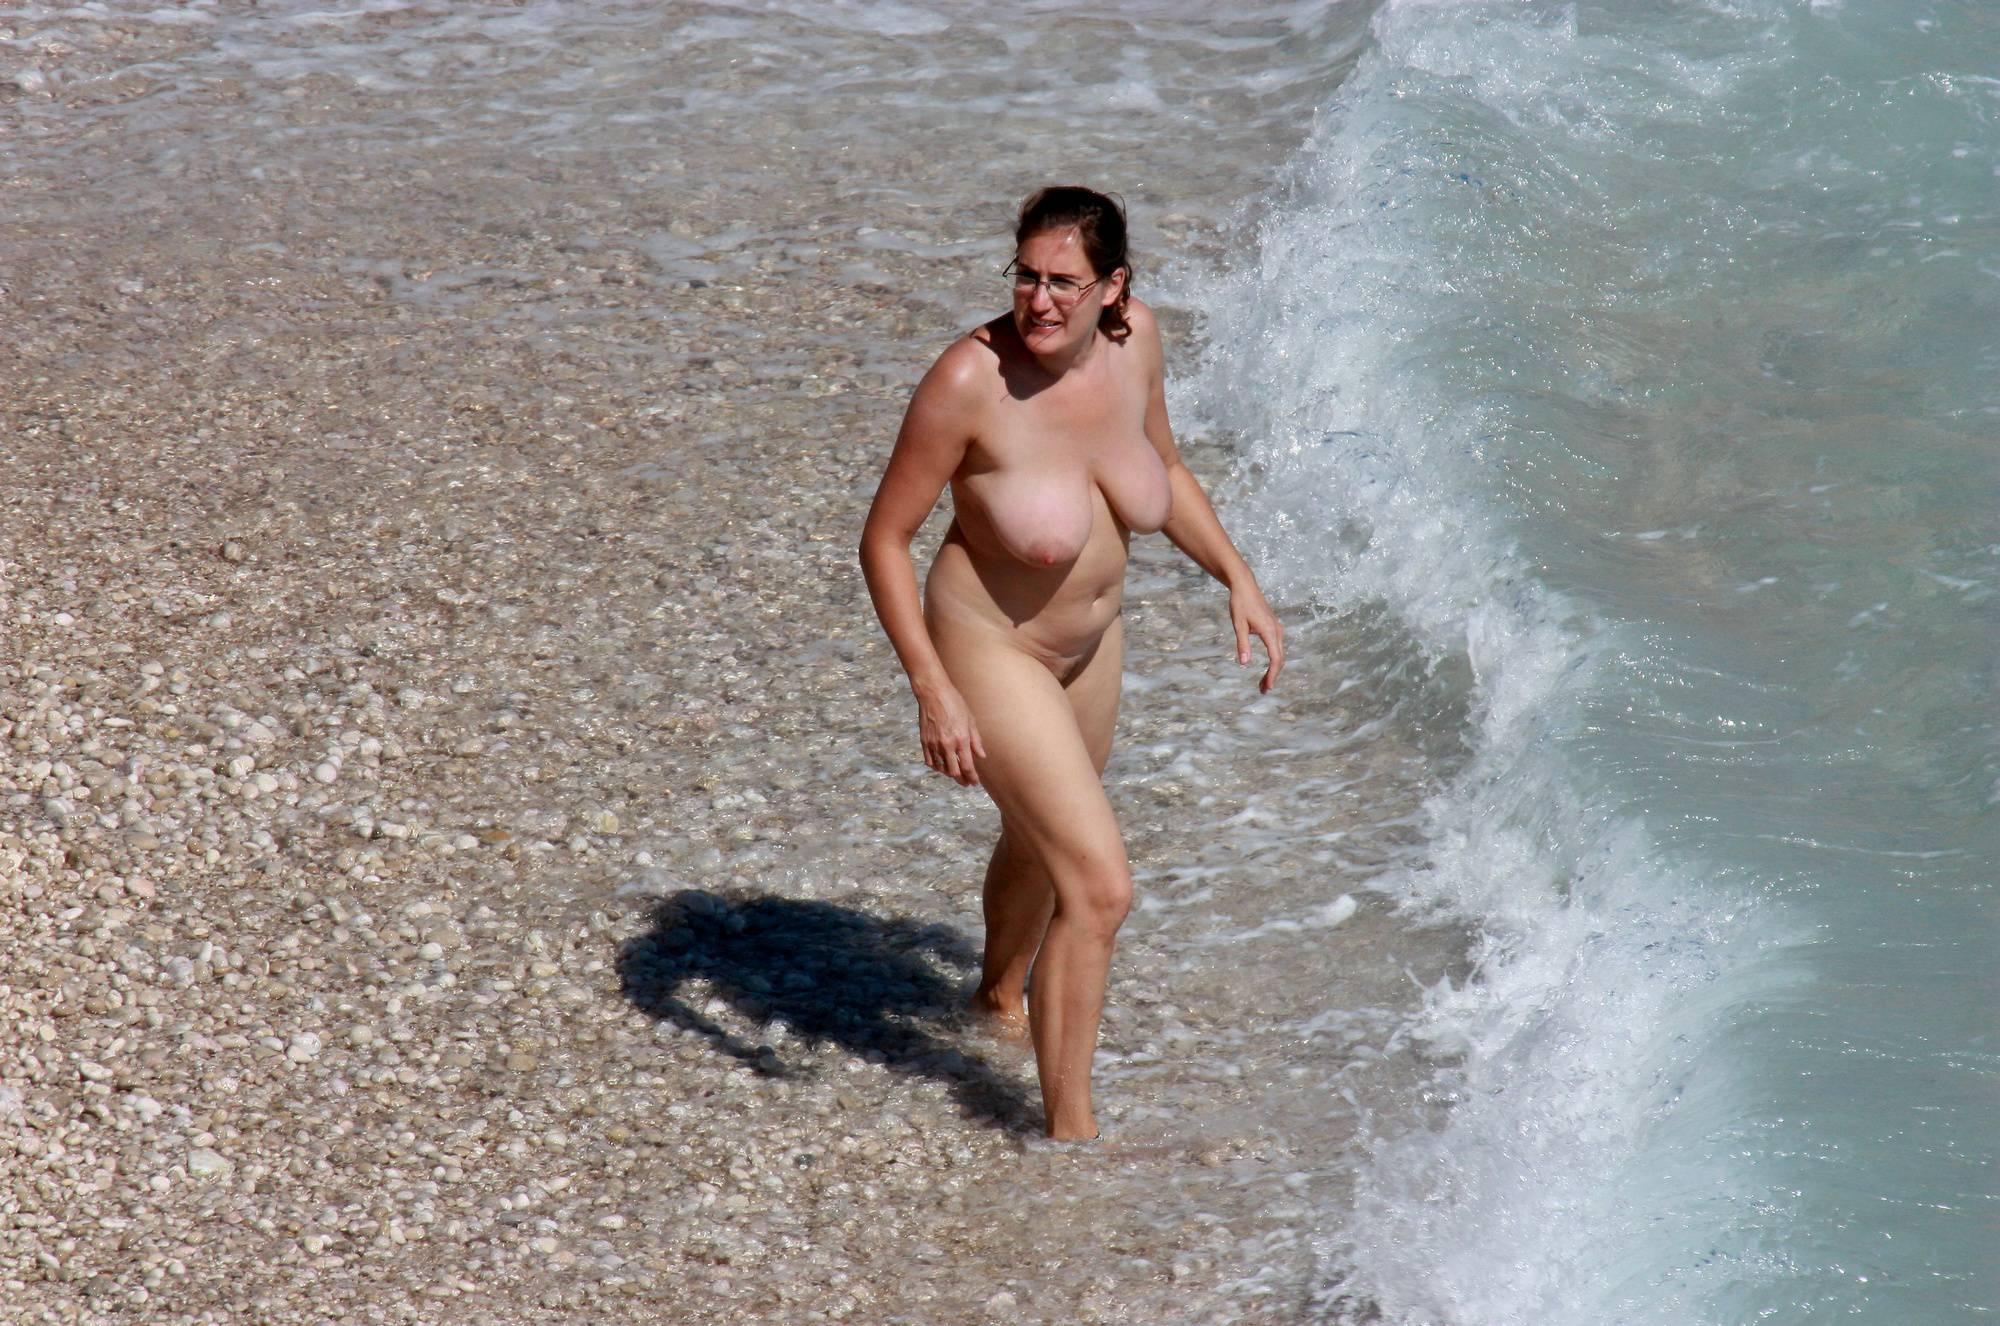 Nudist Gallery Few Water Perspectives - 2